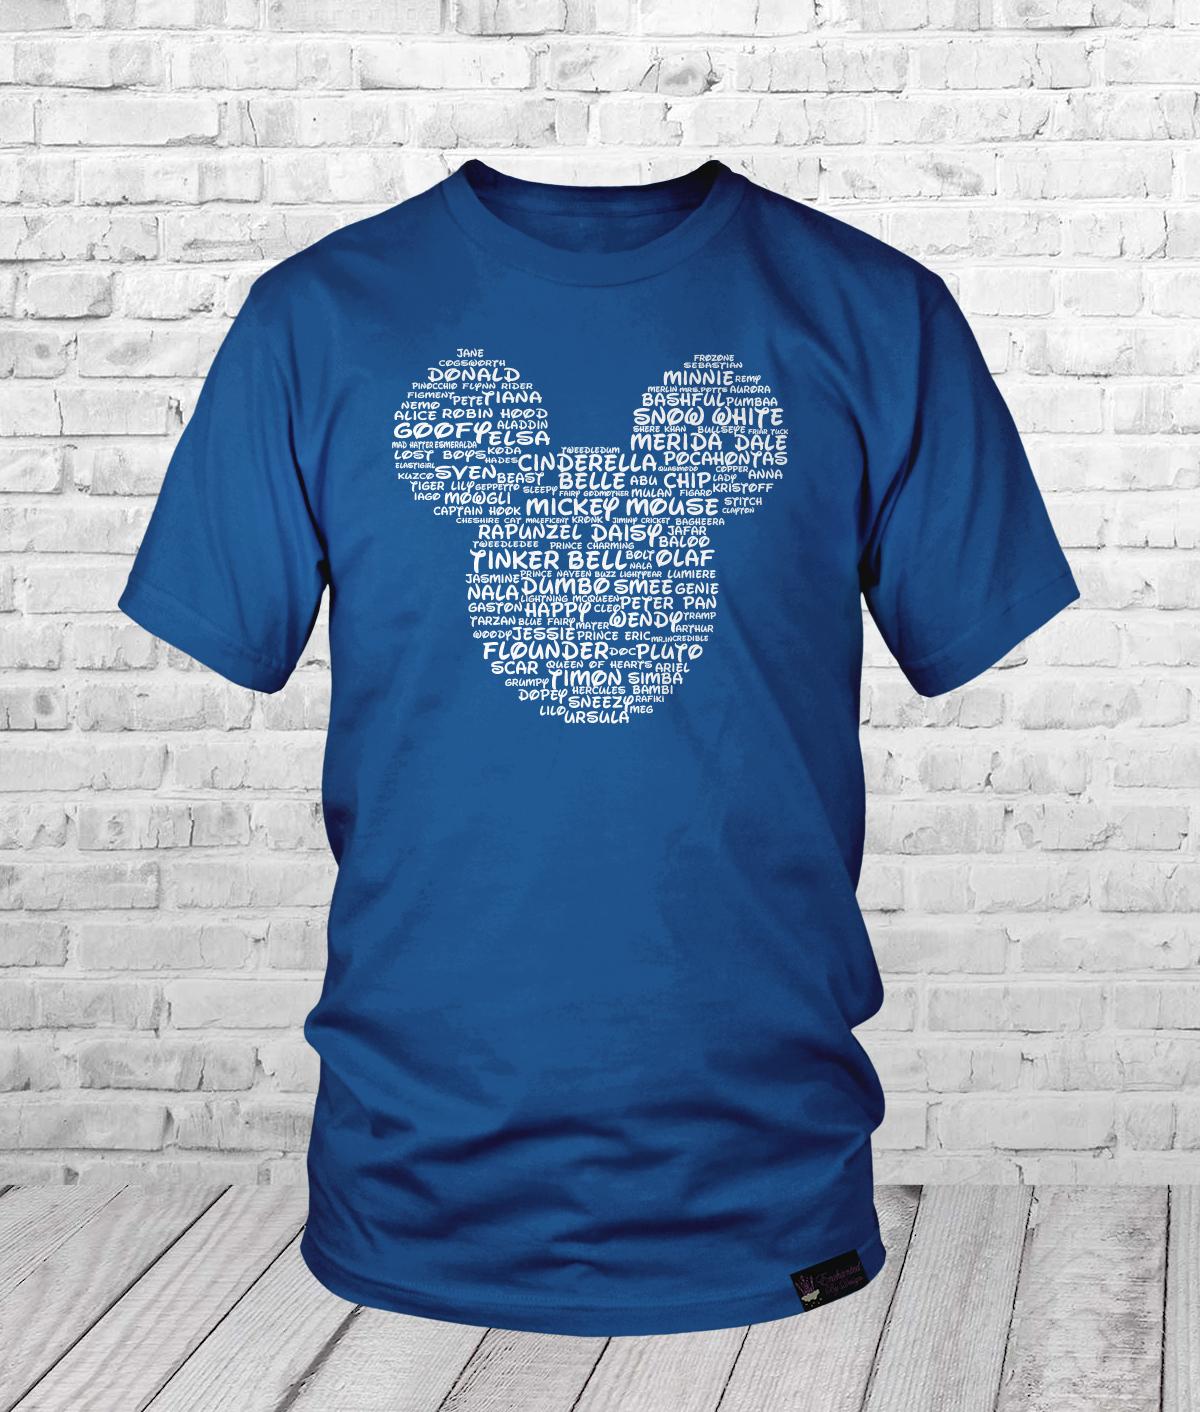 Matching Family Disney Shirts Our T Shirt